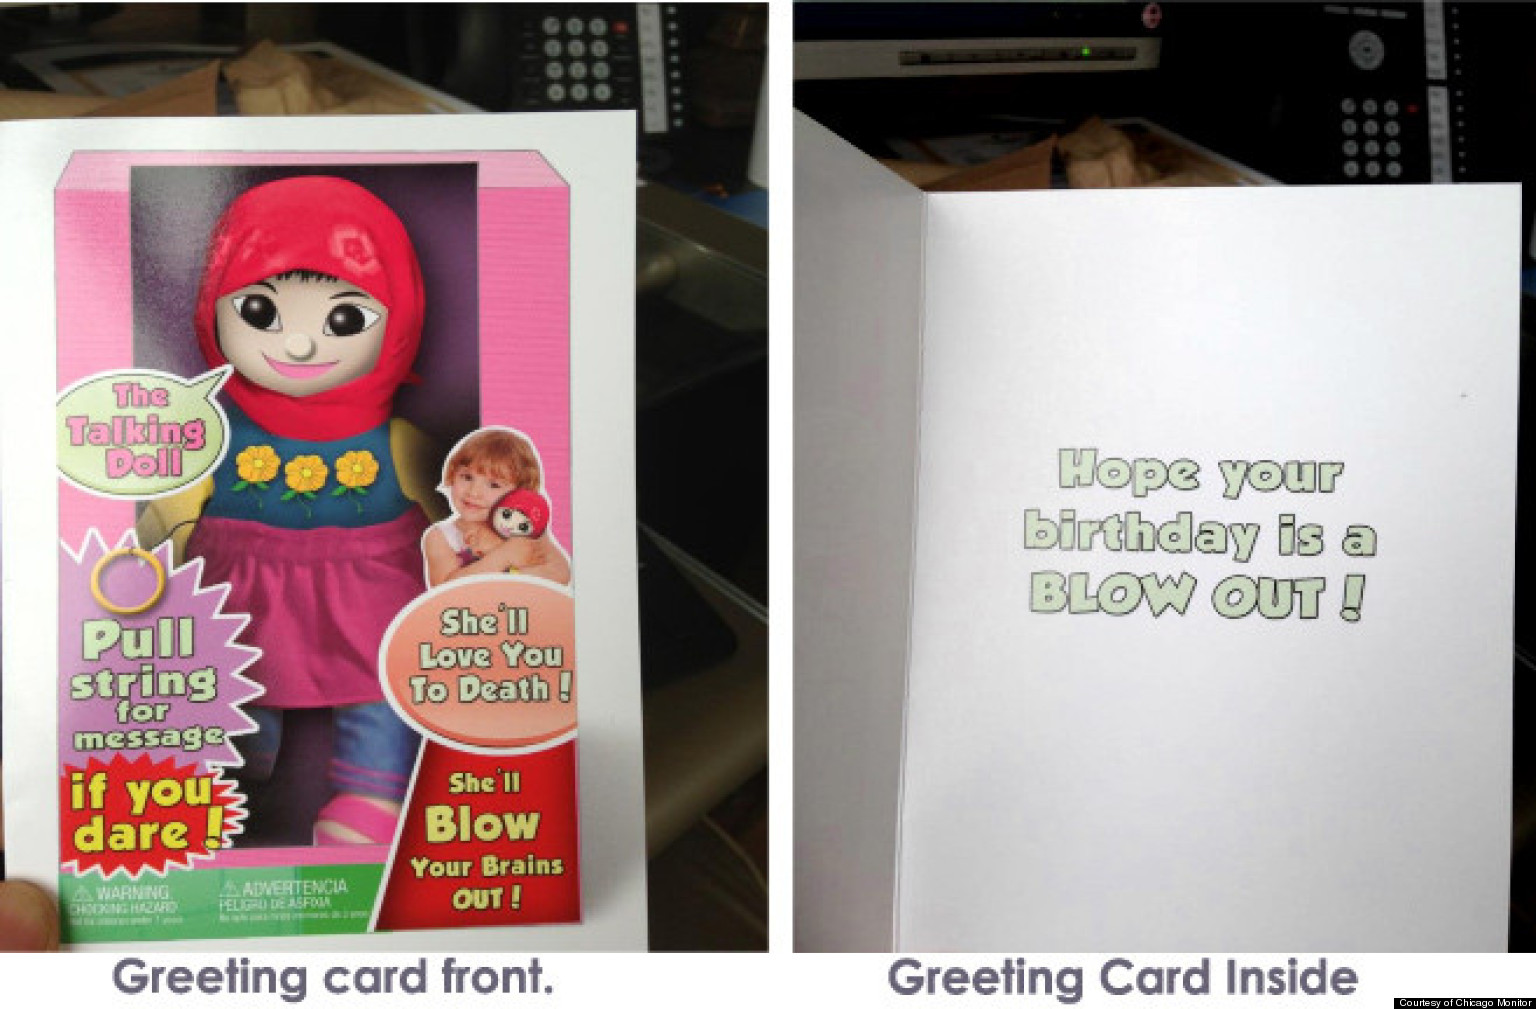 Muslim Terrorist Doll Card Painting Hijab Wearing Girl As Suicide